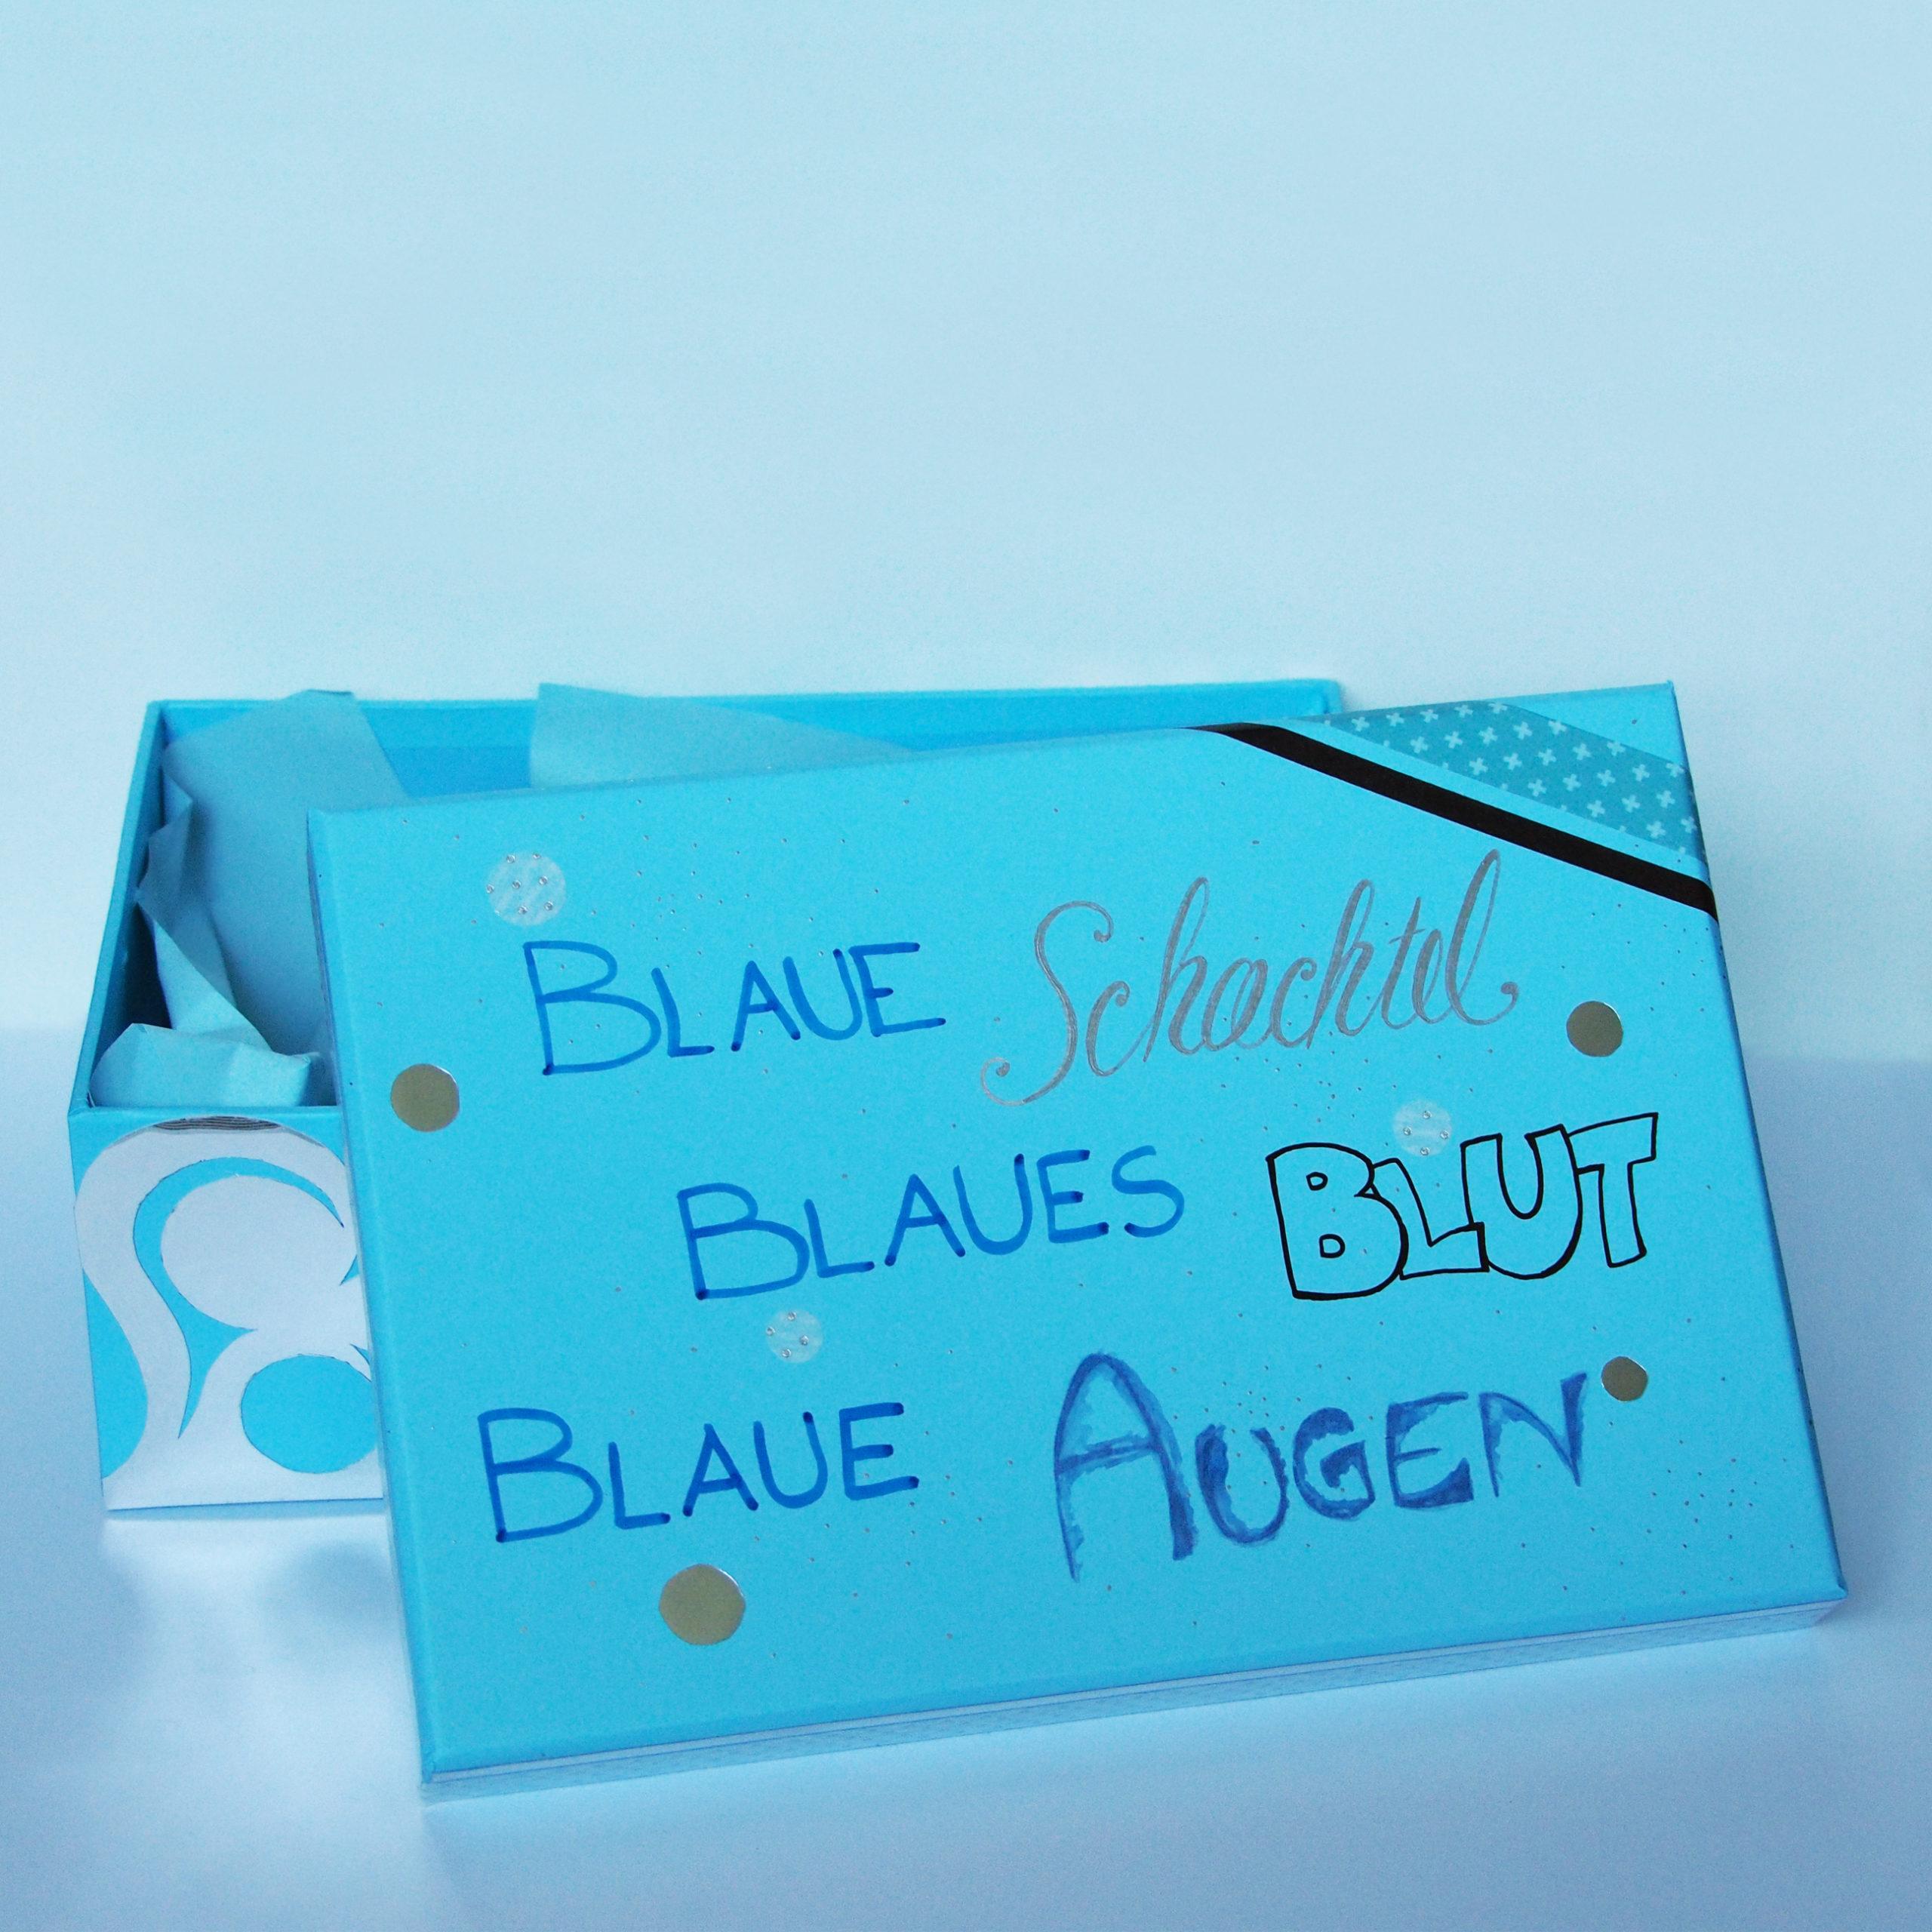 Blaue_Kiste